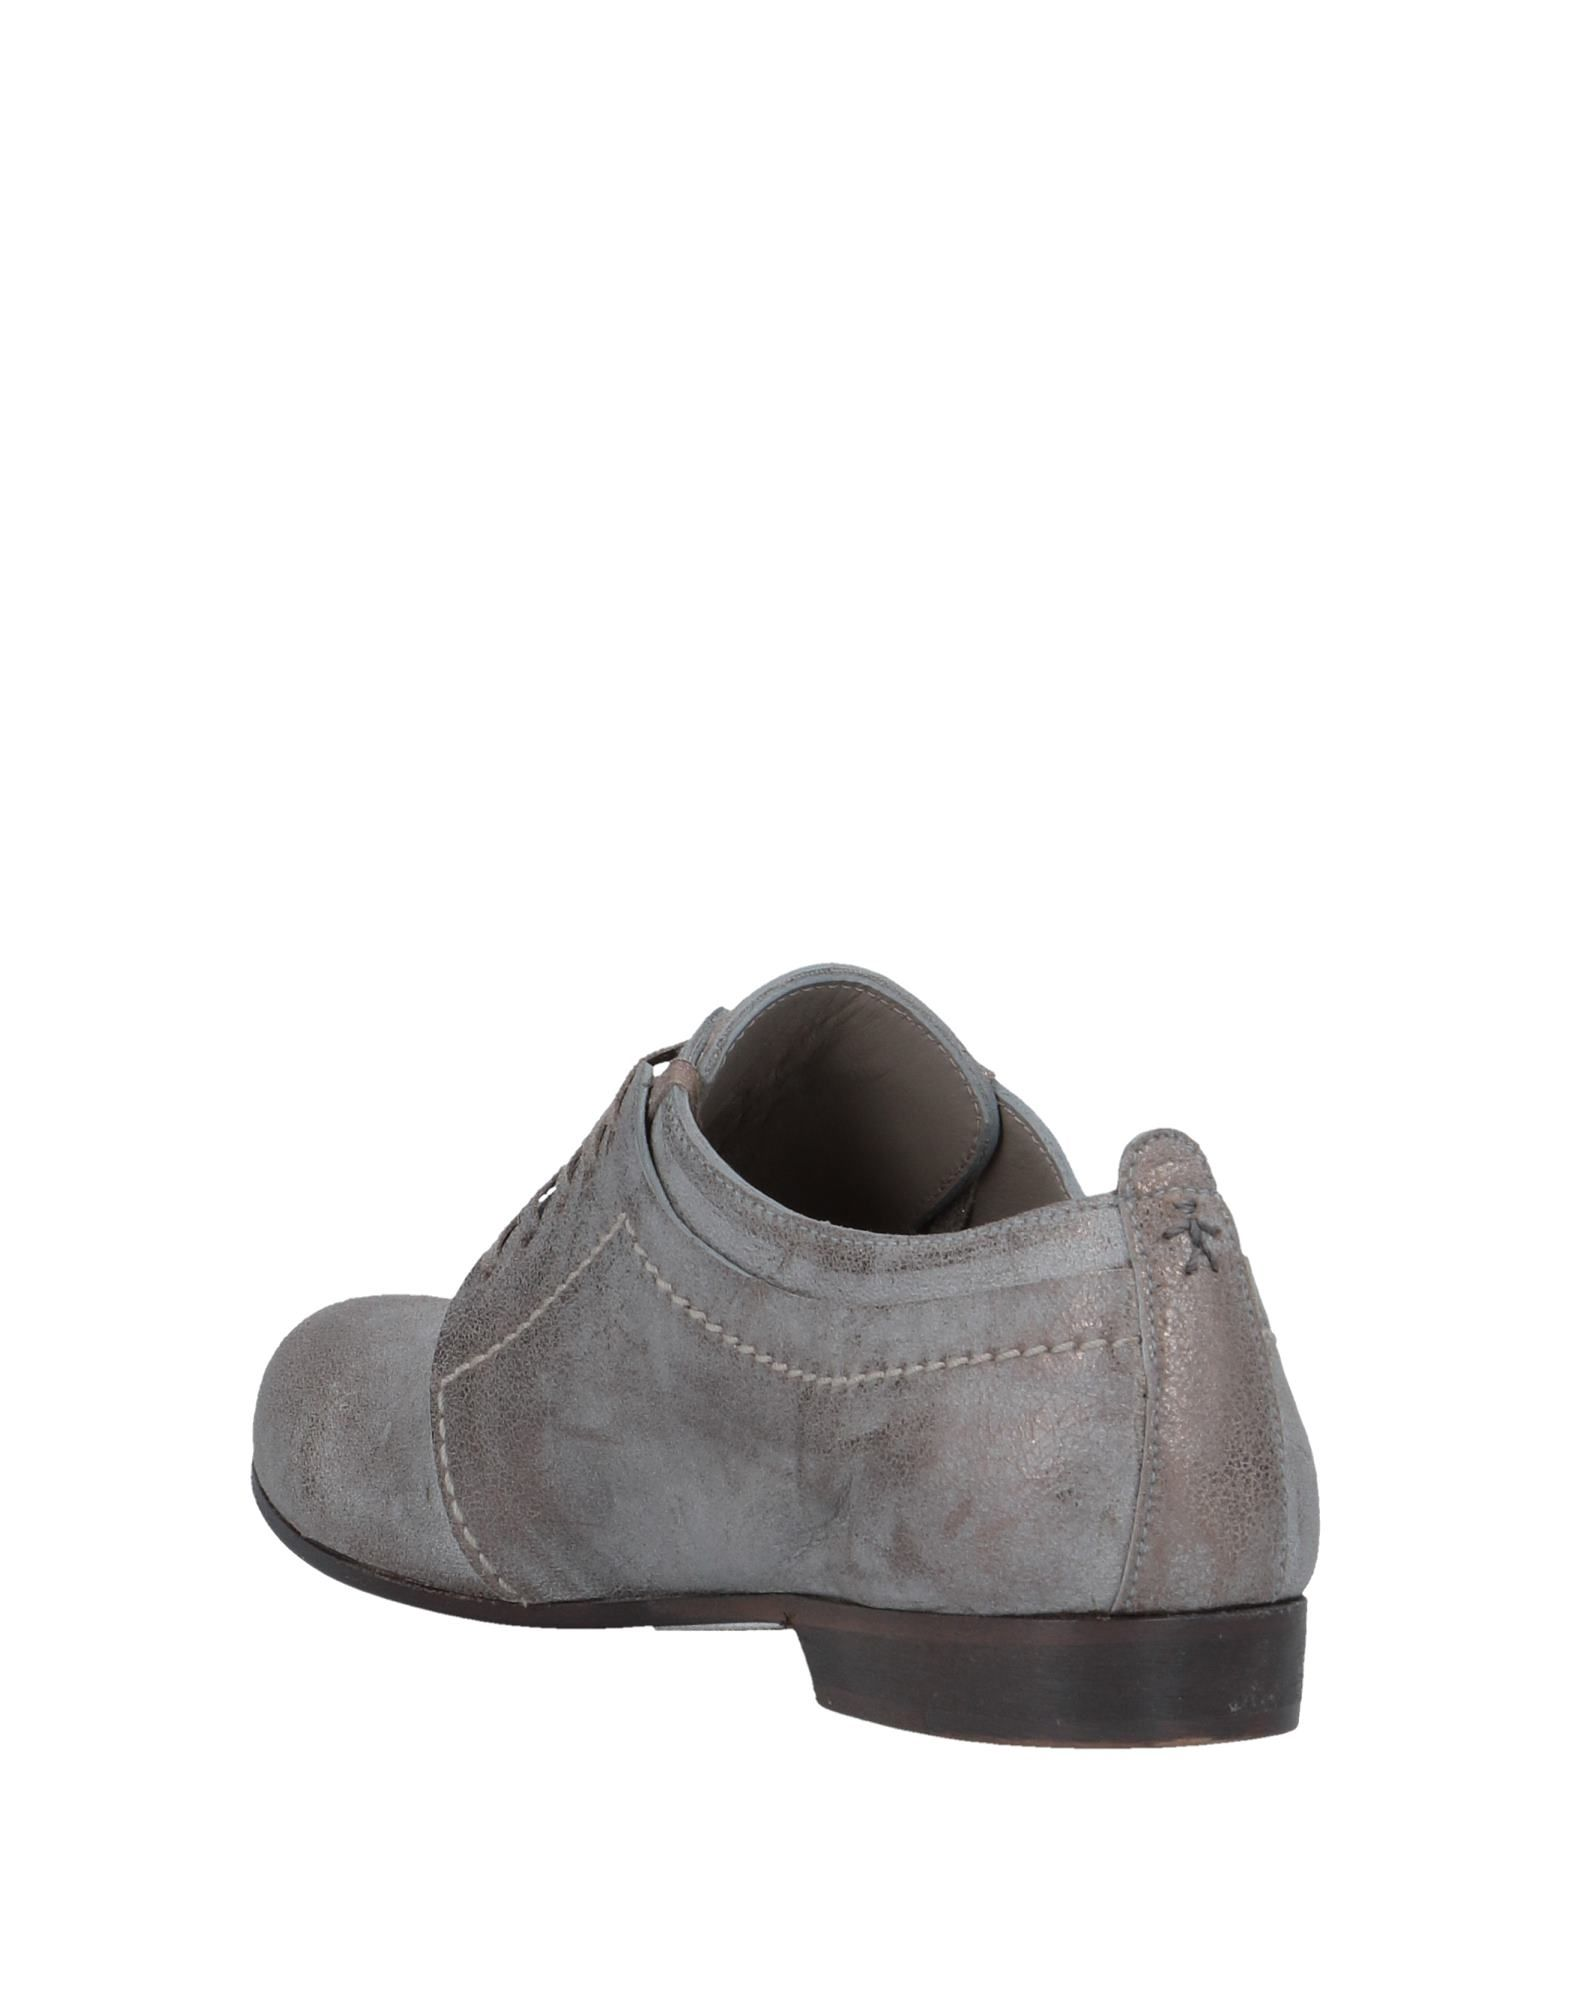 Henry Beguelin Schnürschuhe Damen aussehende  11508505FTGünstige gut aussehende Damen Schuhe d1defa